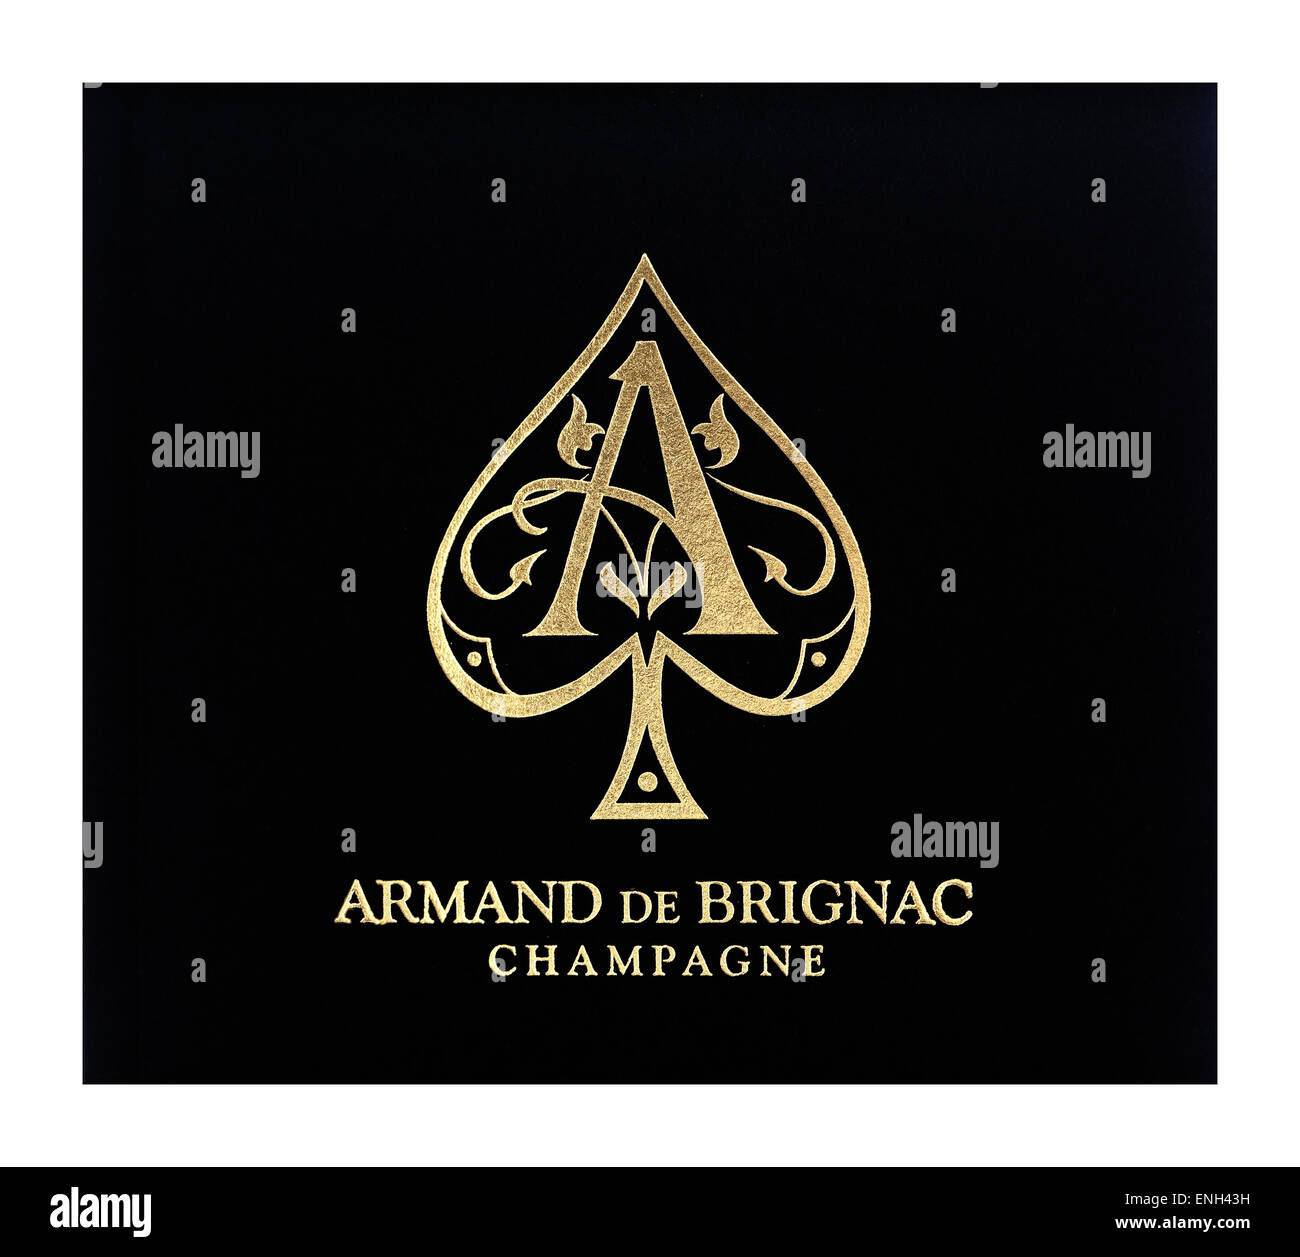 Armand de Brignac 'Ace of Spades' luxury champagne label - Stock Image